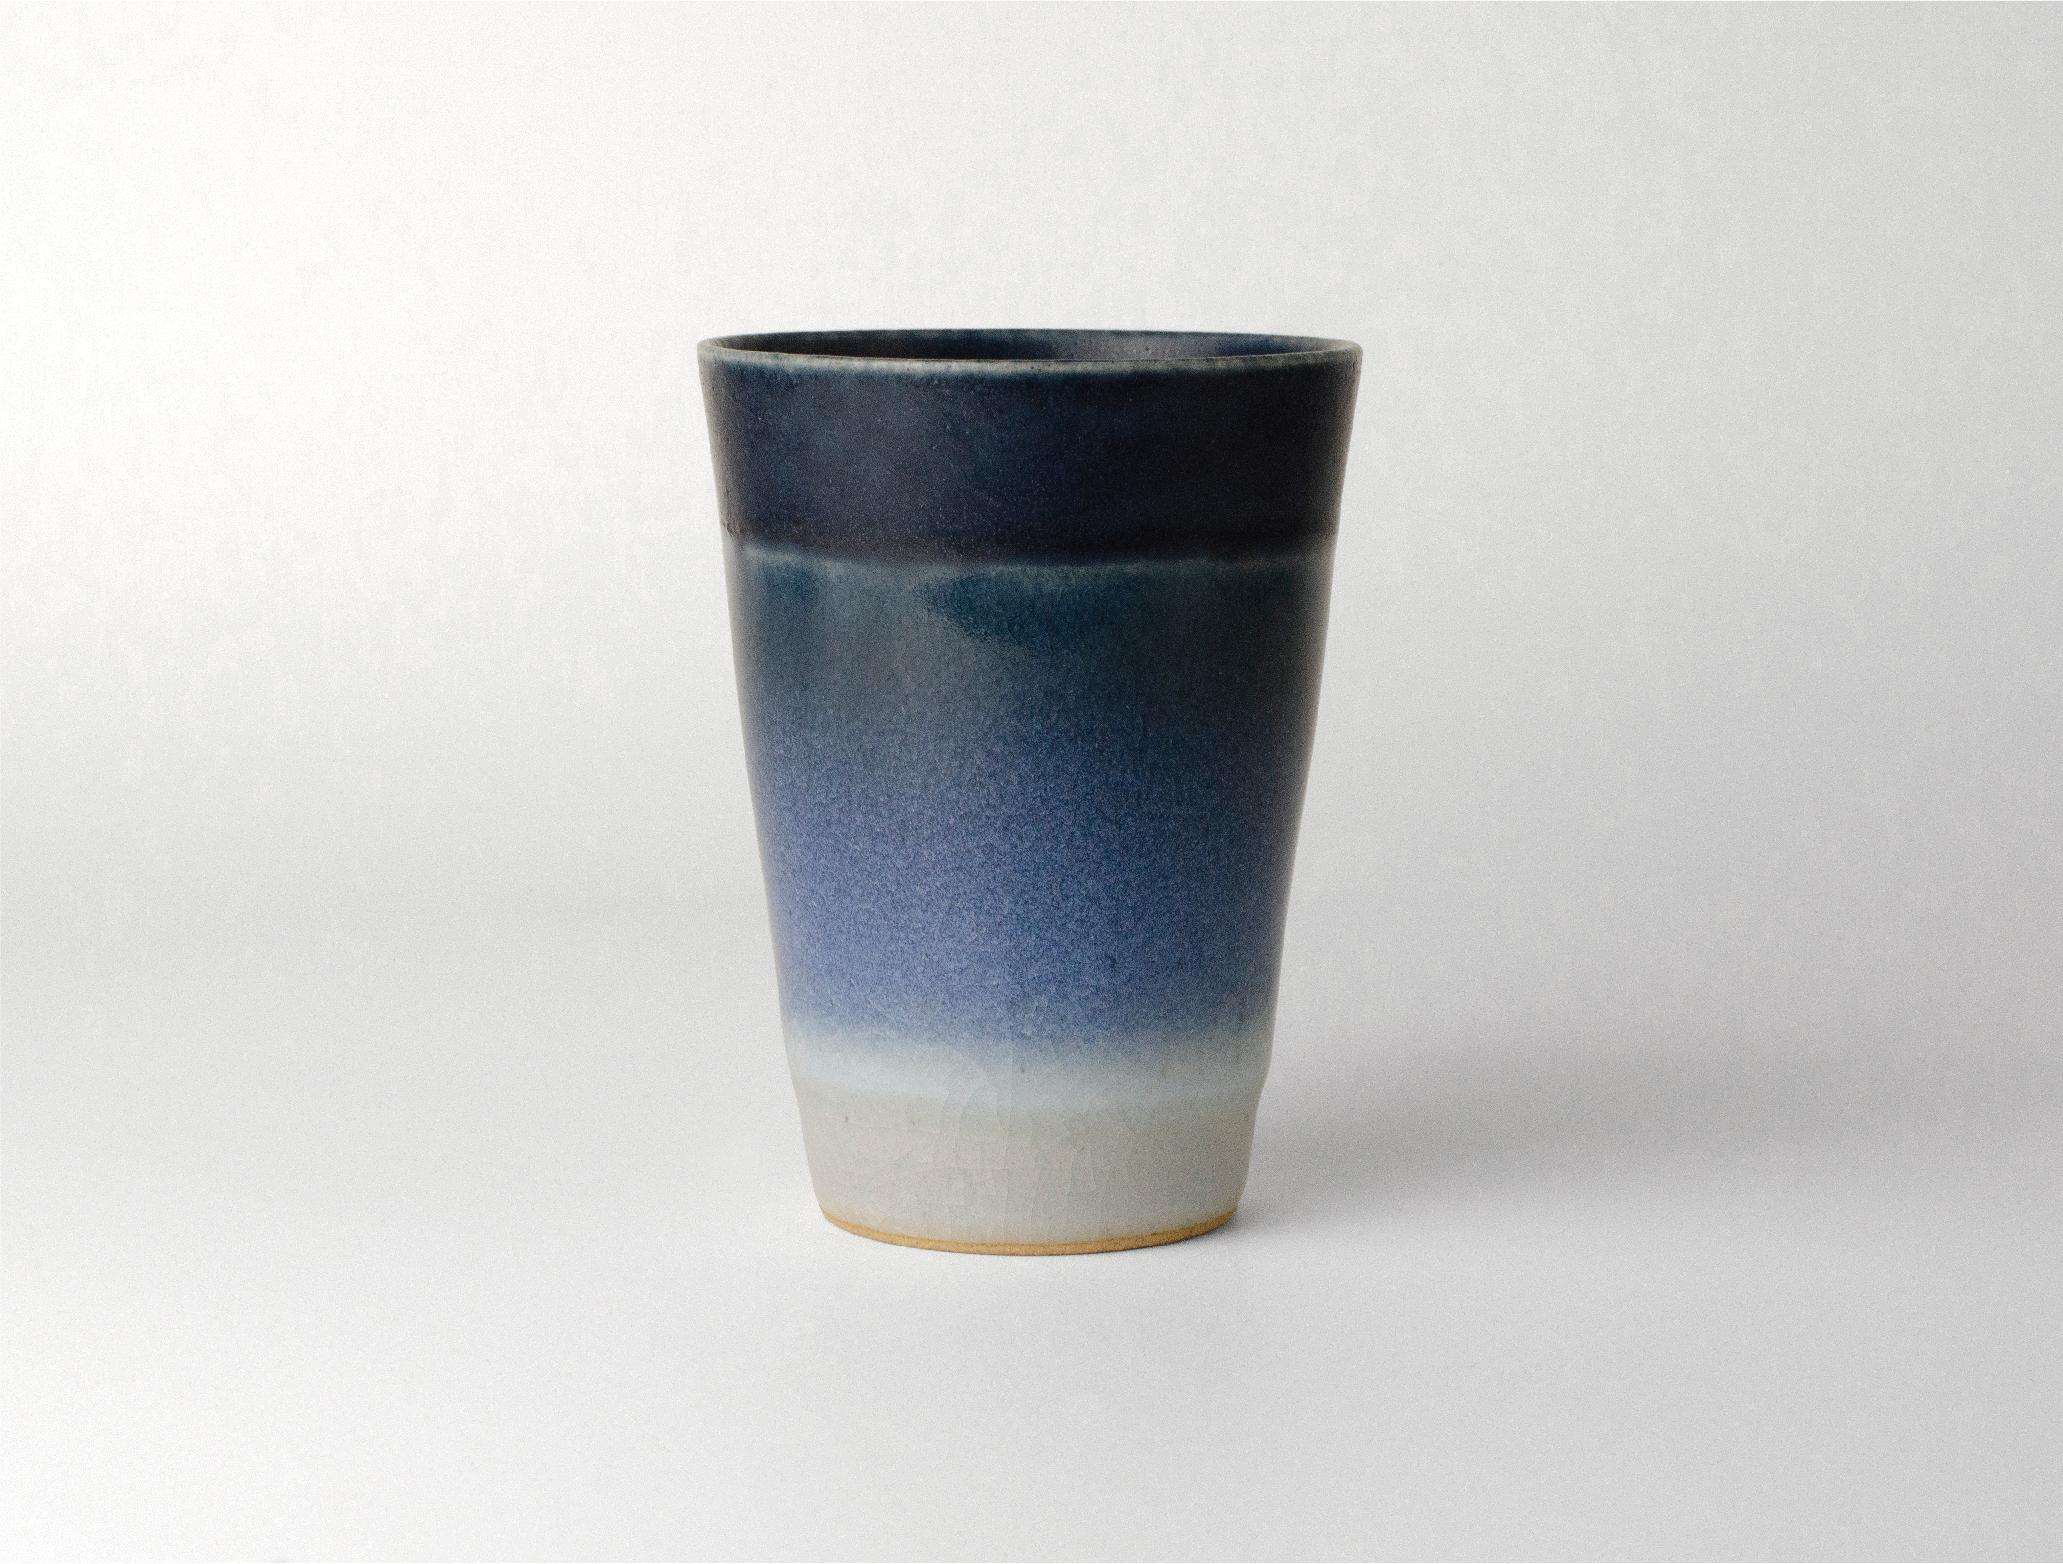 Fujisan_fuyu 250mlカップ イメージ